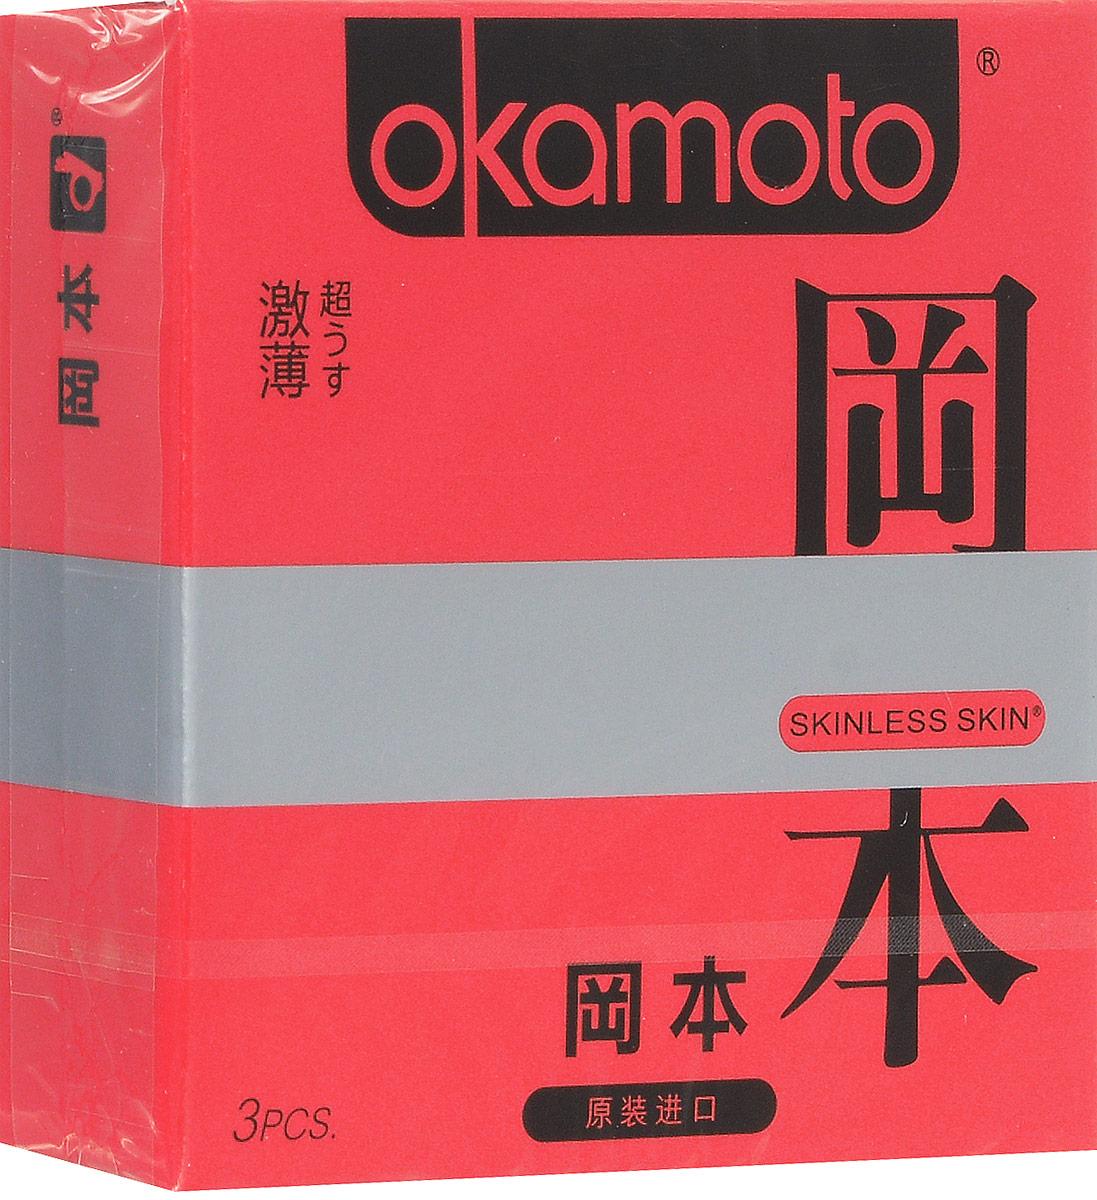 Презервативы Okamоto Skinless Skin Super Thin 3 шт с двойной смазкой